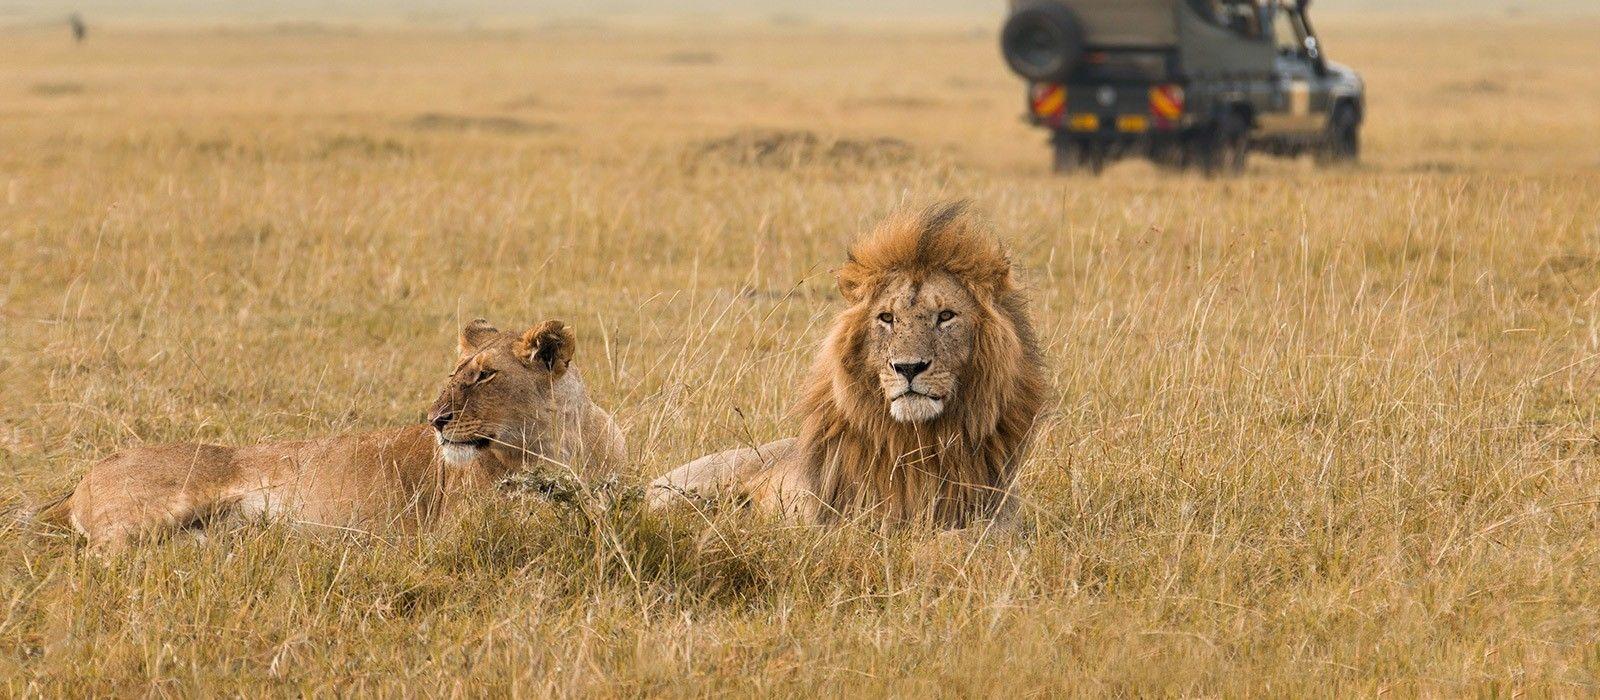 Kenya & Rwanda: Call of the Wild Tour Trip 4